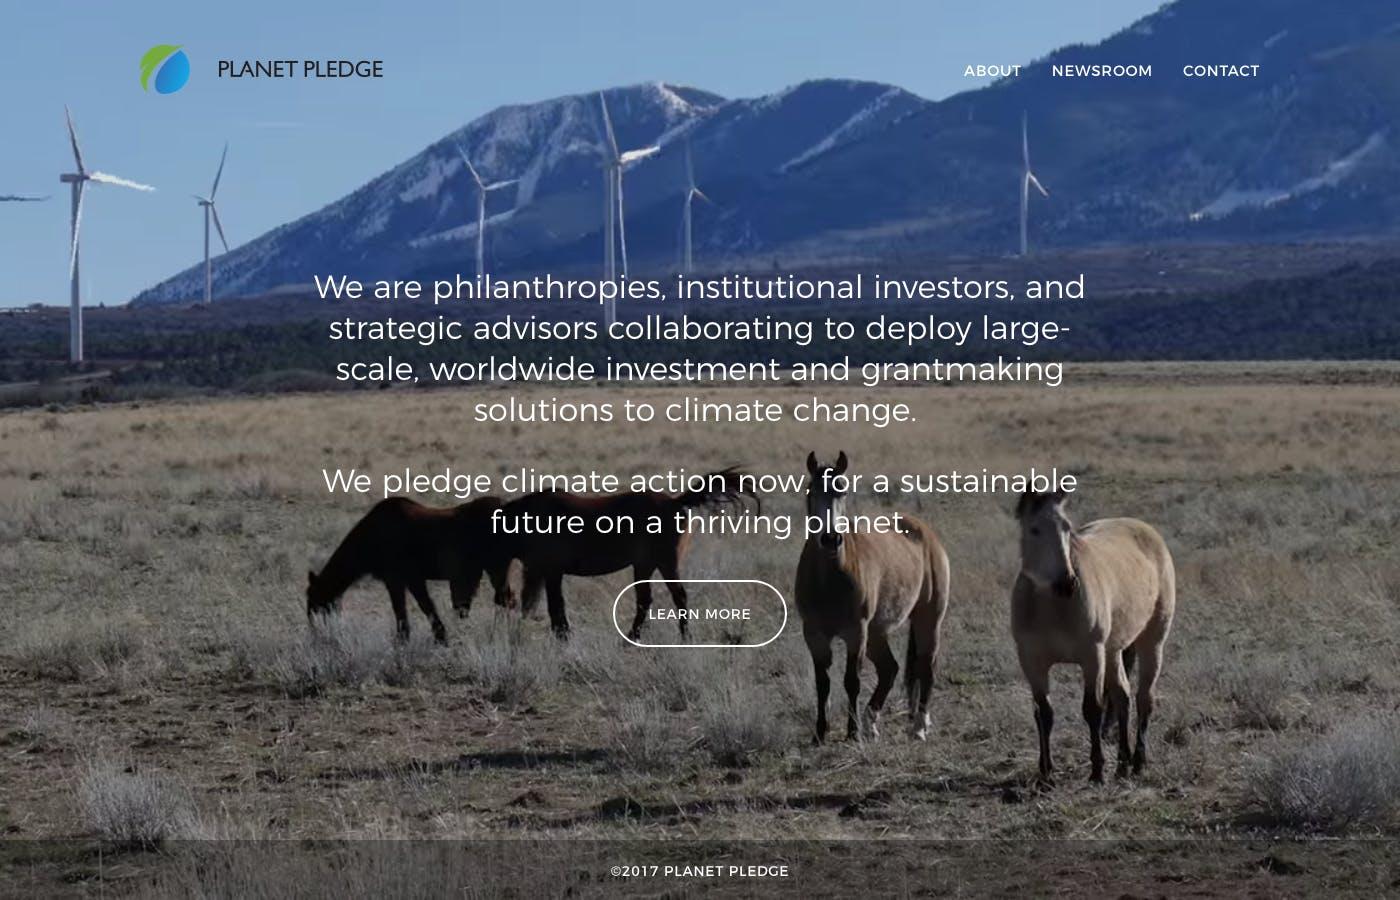 Planet Pledge